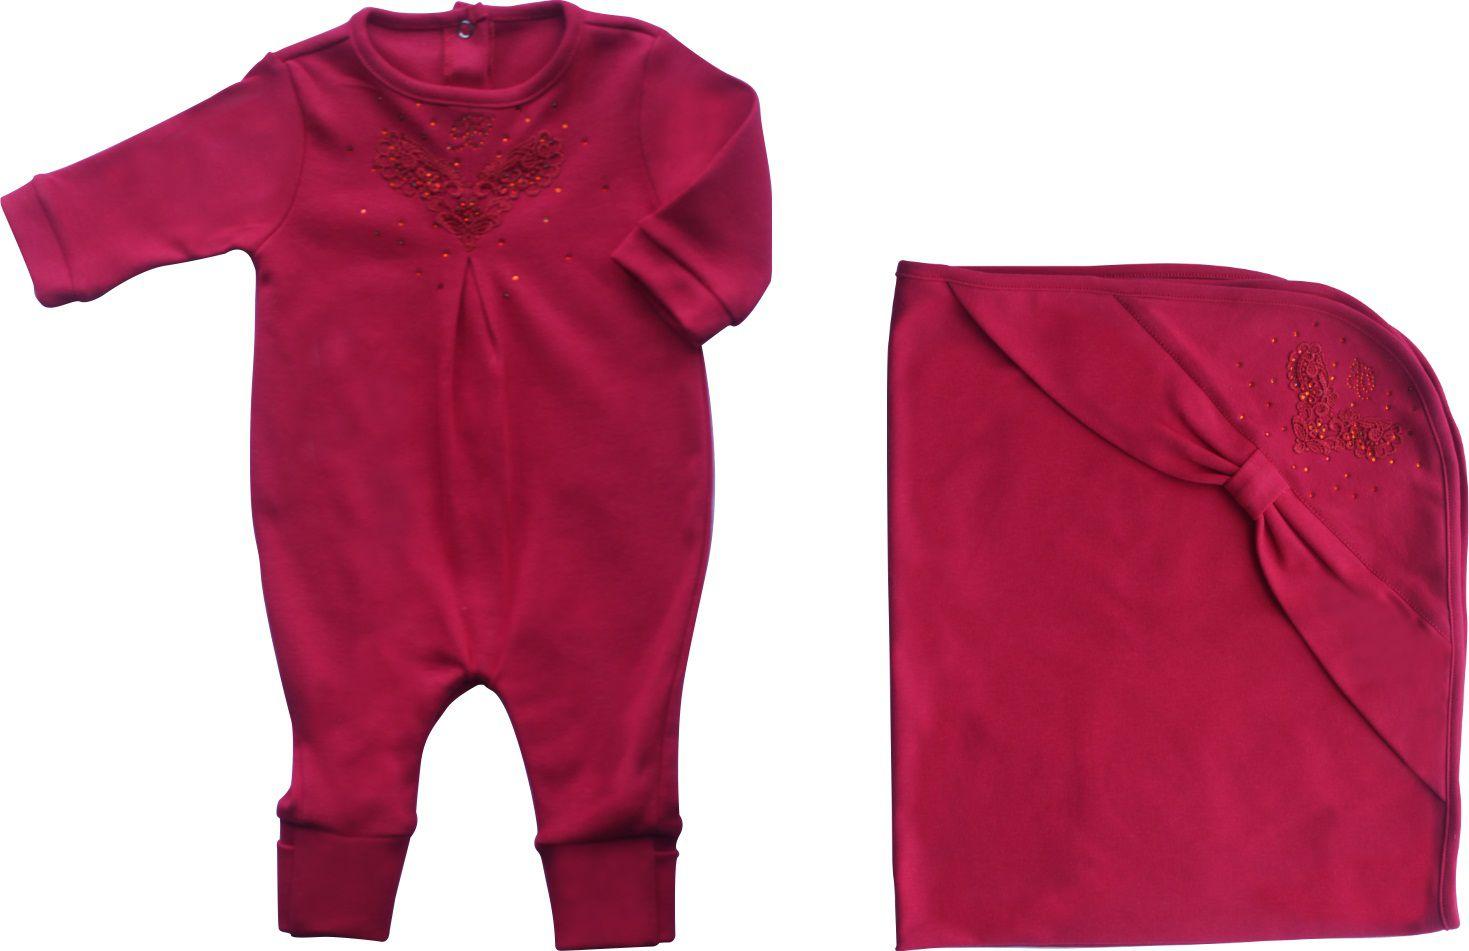 Conjunto Maternidade Feminina Vermelha.